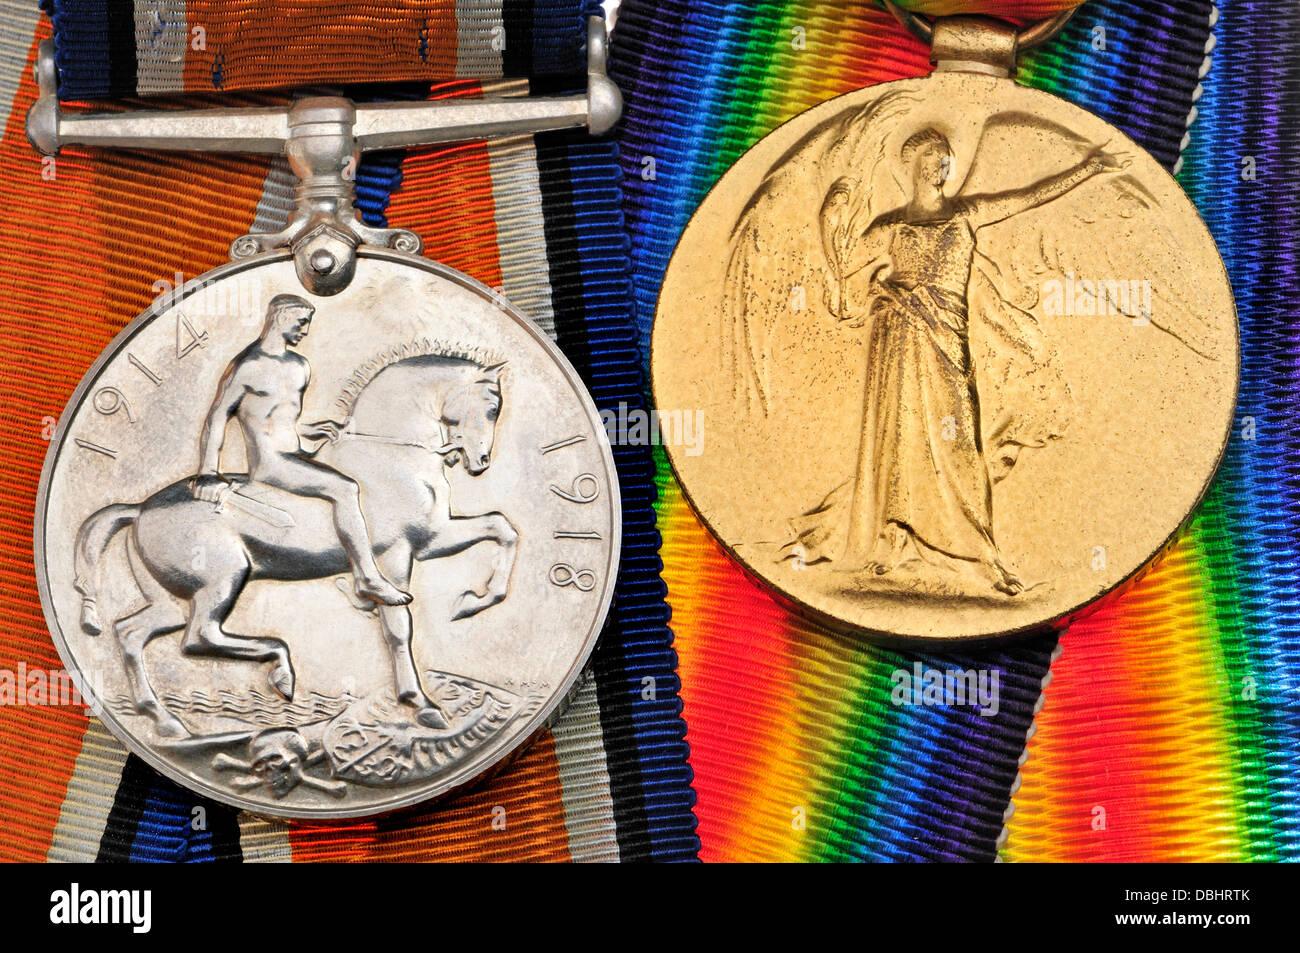 First World War British medals. Victory Medal (golden) War Medal (silver) - Stock Image